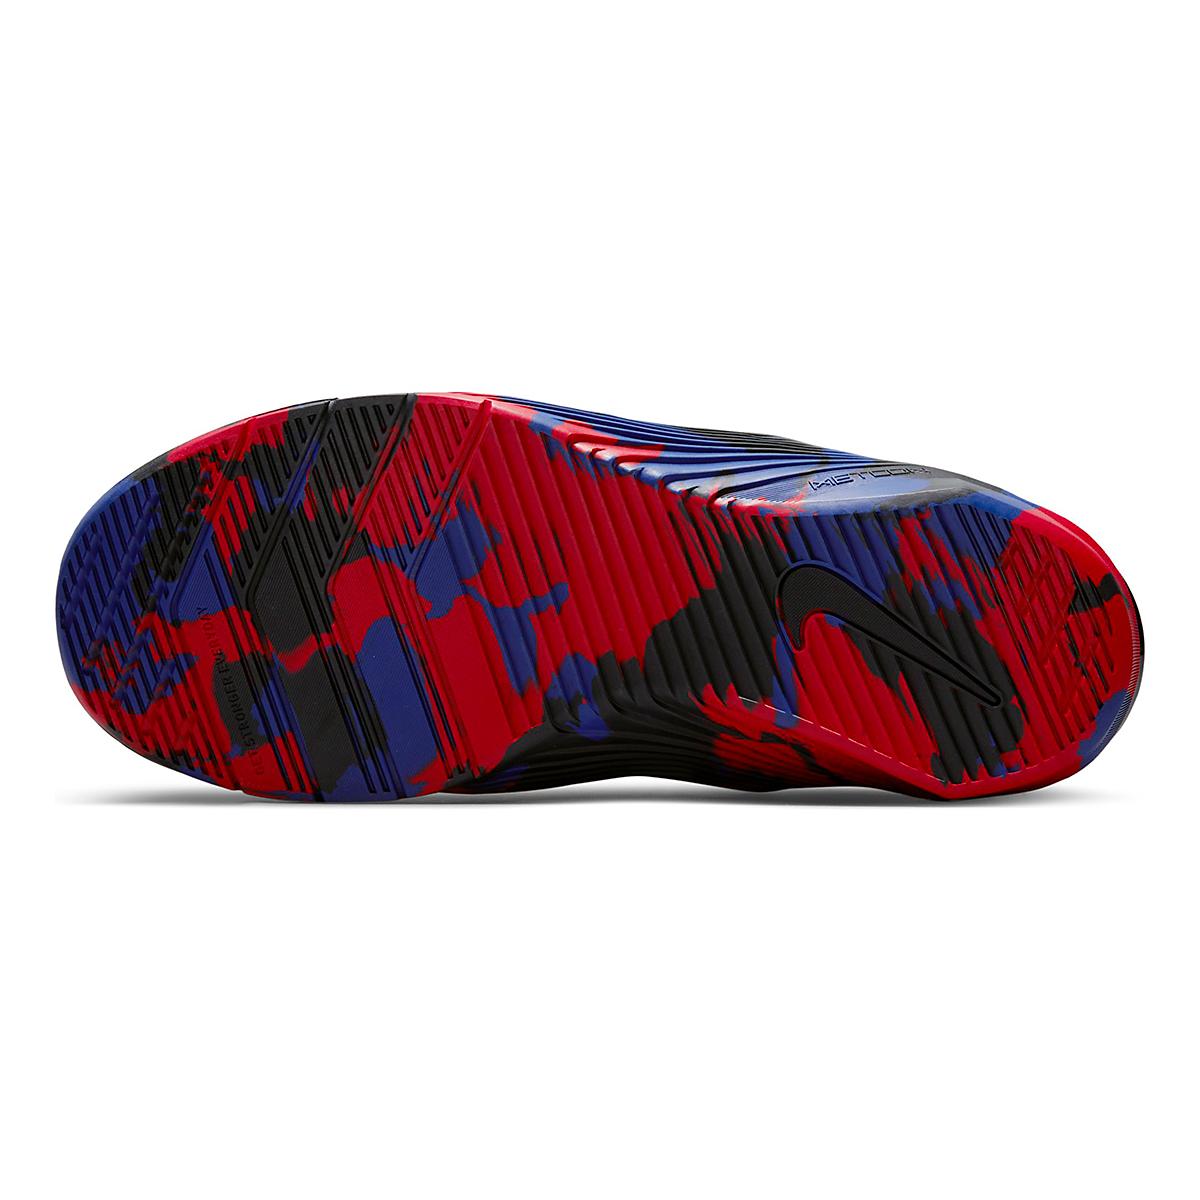 Men's Nike Metcon 6 Training Shoe - Color: White/Black/Gym Red/Deep Royal Blue - Size: 4 - Width: Regular, White/Black/Gym Red/Deep Royal Blue, large, image 3